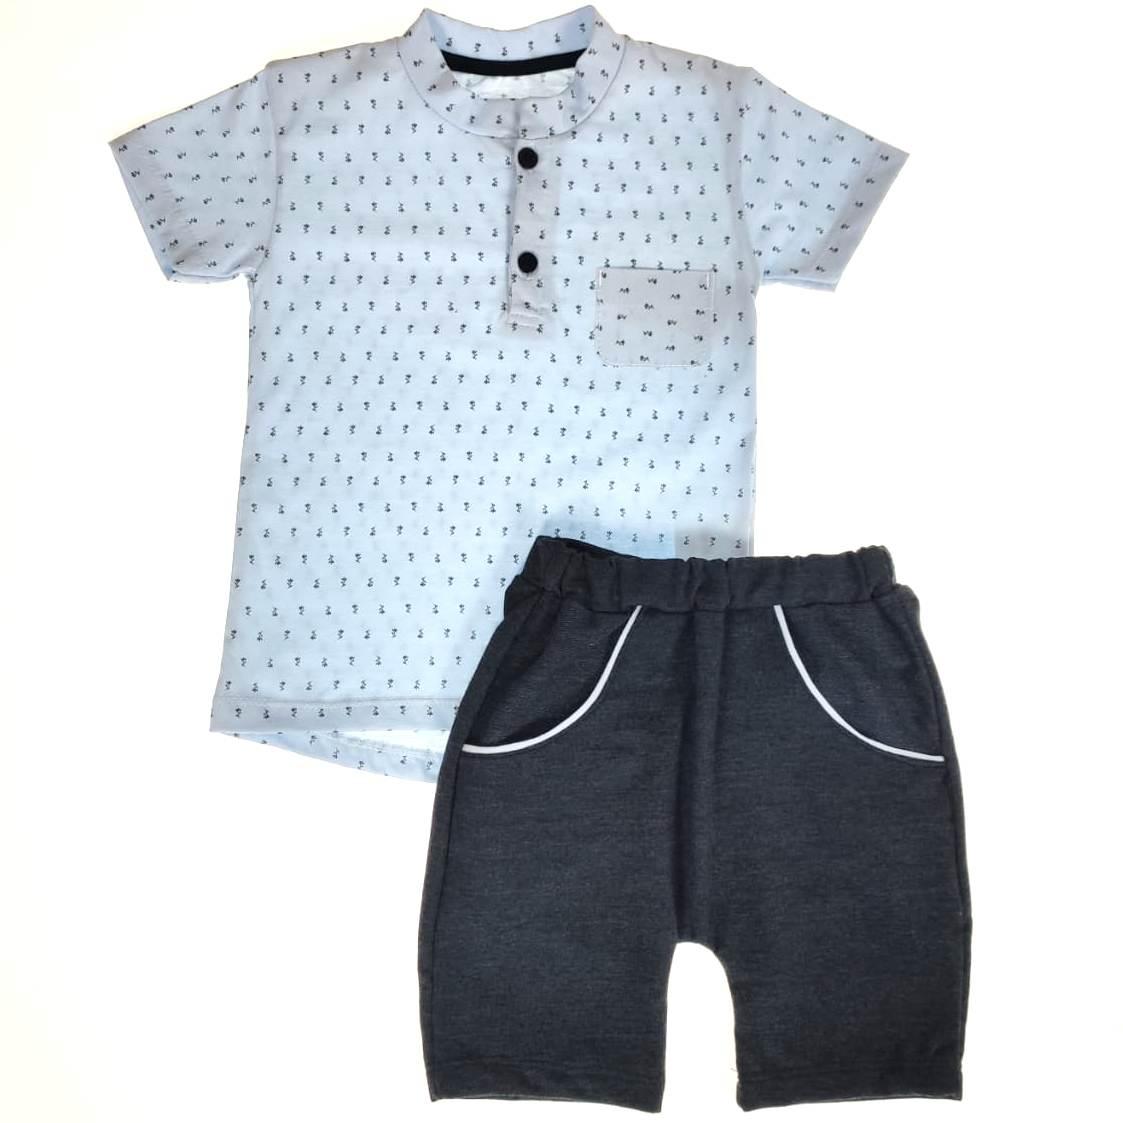 Conjunto Curto Kids  - Azul e Preto Moletinho